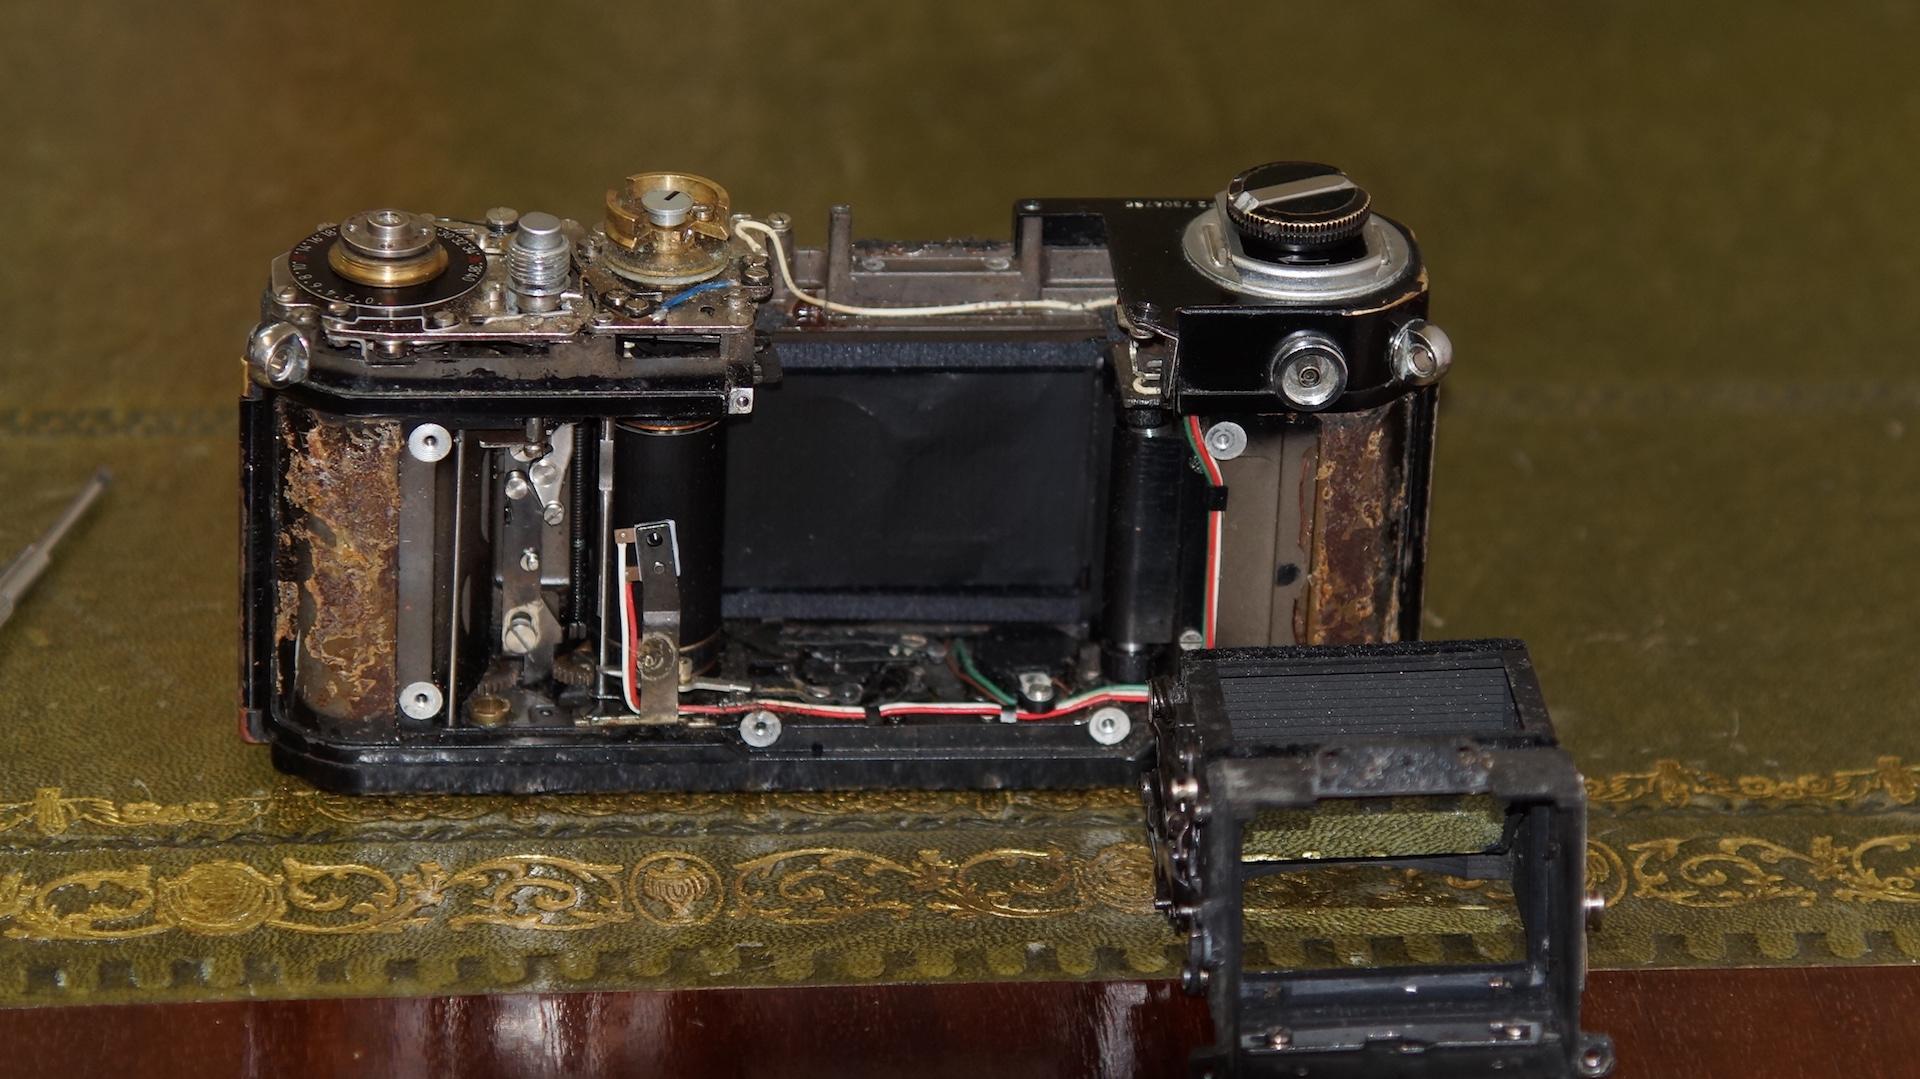 Nikon F2 - DIY Repairs & Maintenance | Photrio com